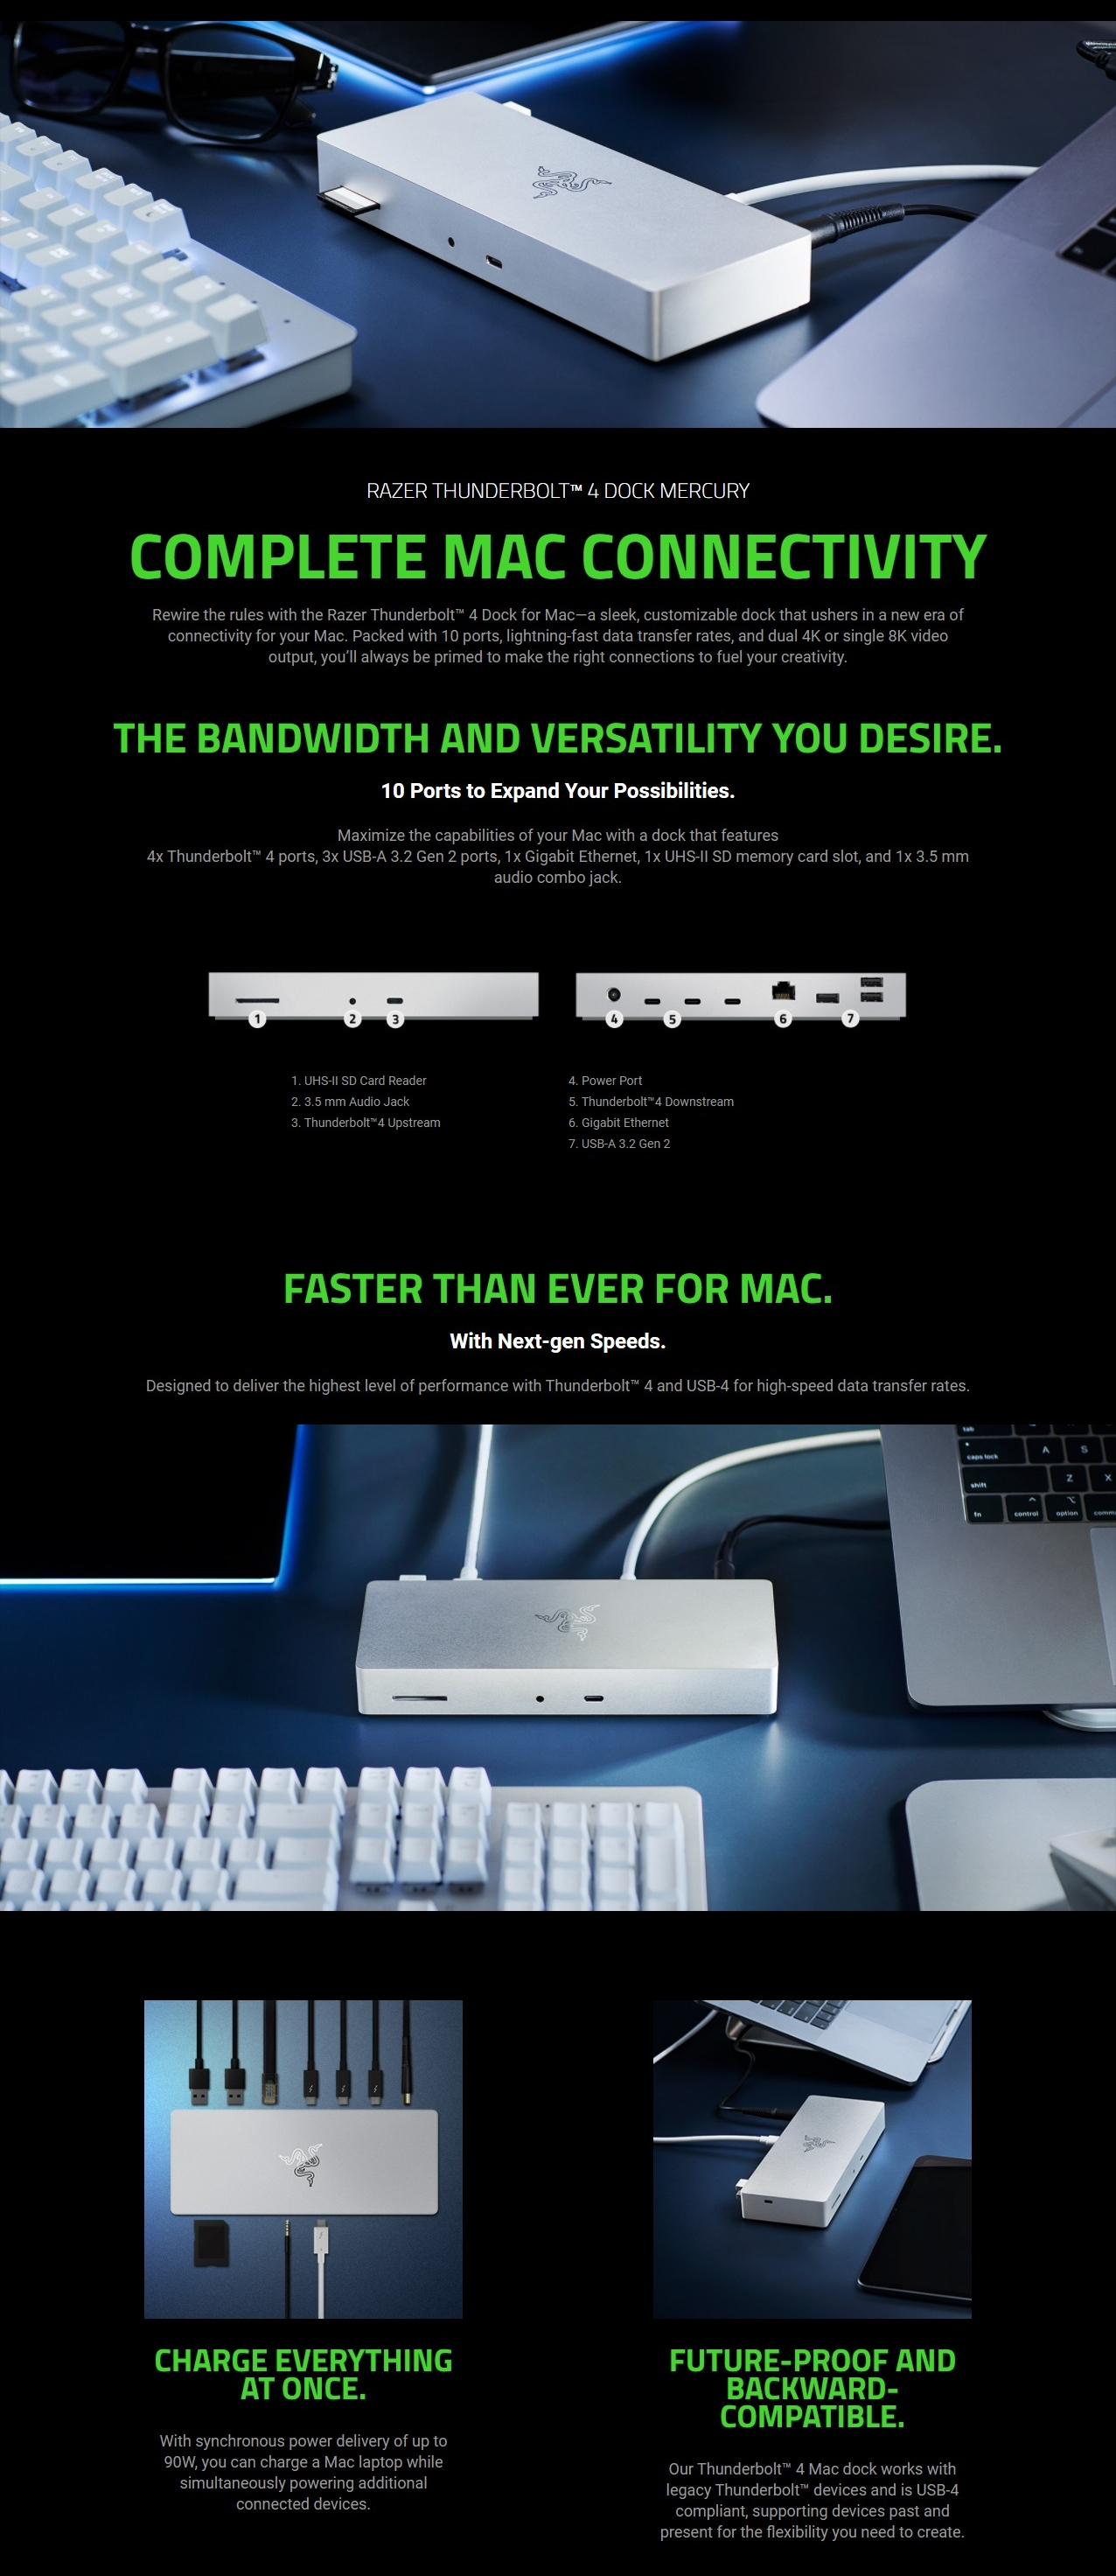 A large marketing image providing additional information about the product Razer Thunderbolt 4 Dock - Mercury - Additional alt info not provided